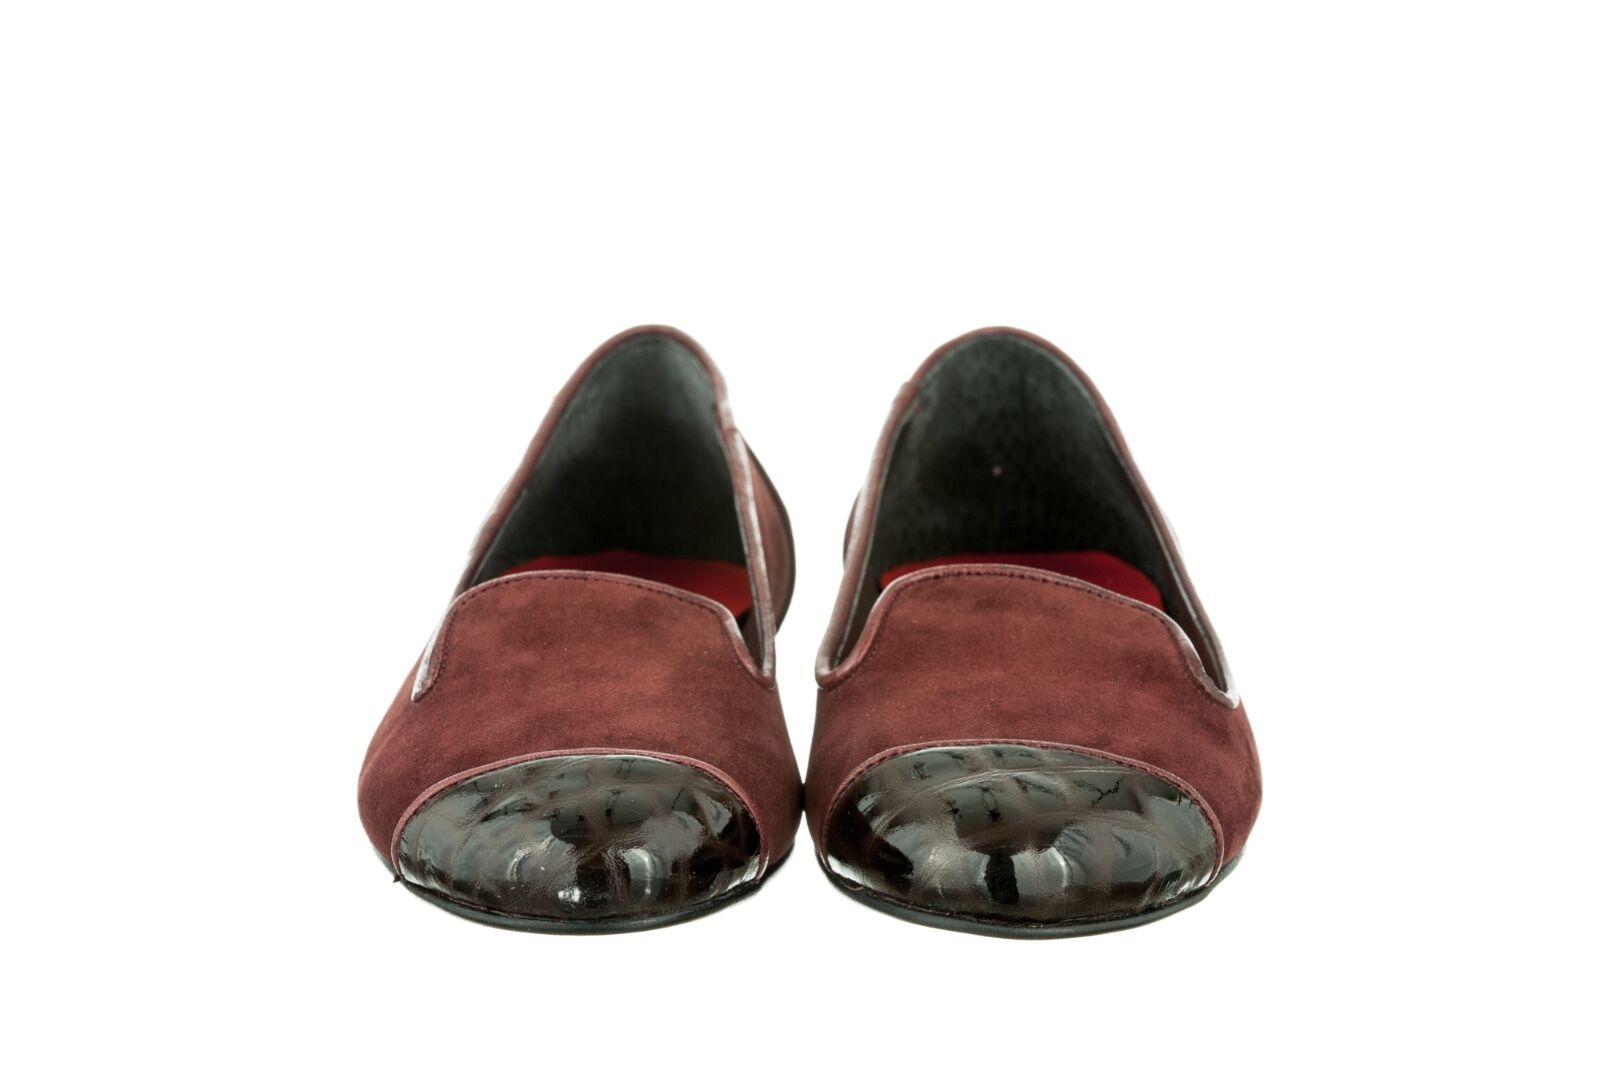 MORI MADE ITALY SLIP BALLERINA ON FLATS SCHUHE Schuhe BALLERINA SLIP LEATHER BORDEAUX BORDO 44 4dce75